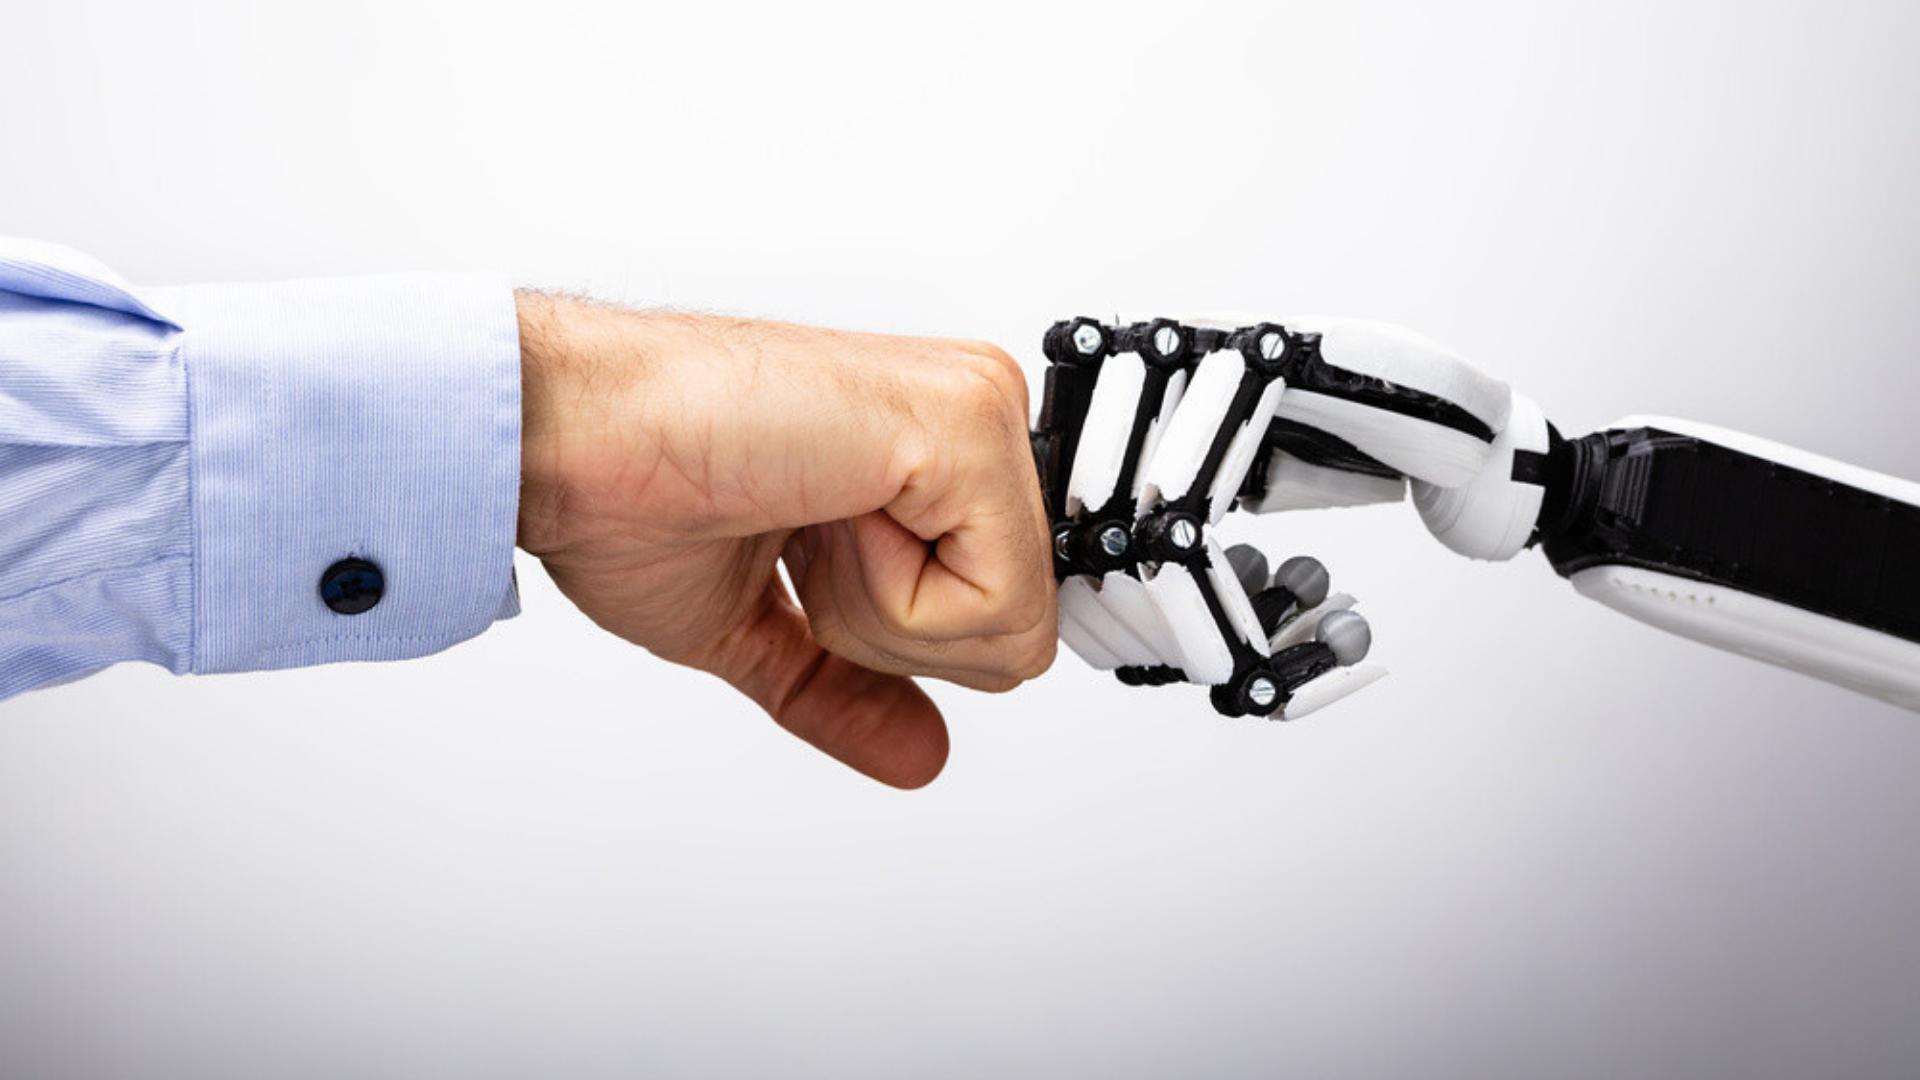 roboticsandcodingfuture